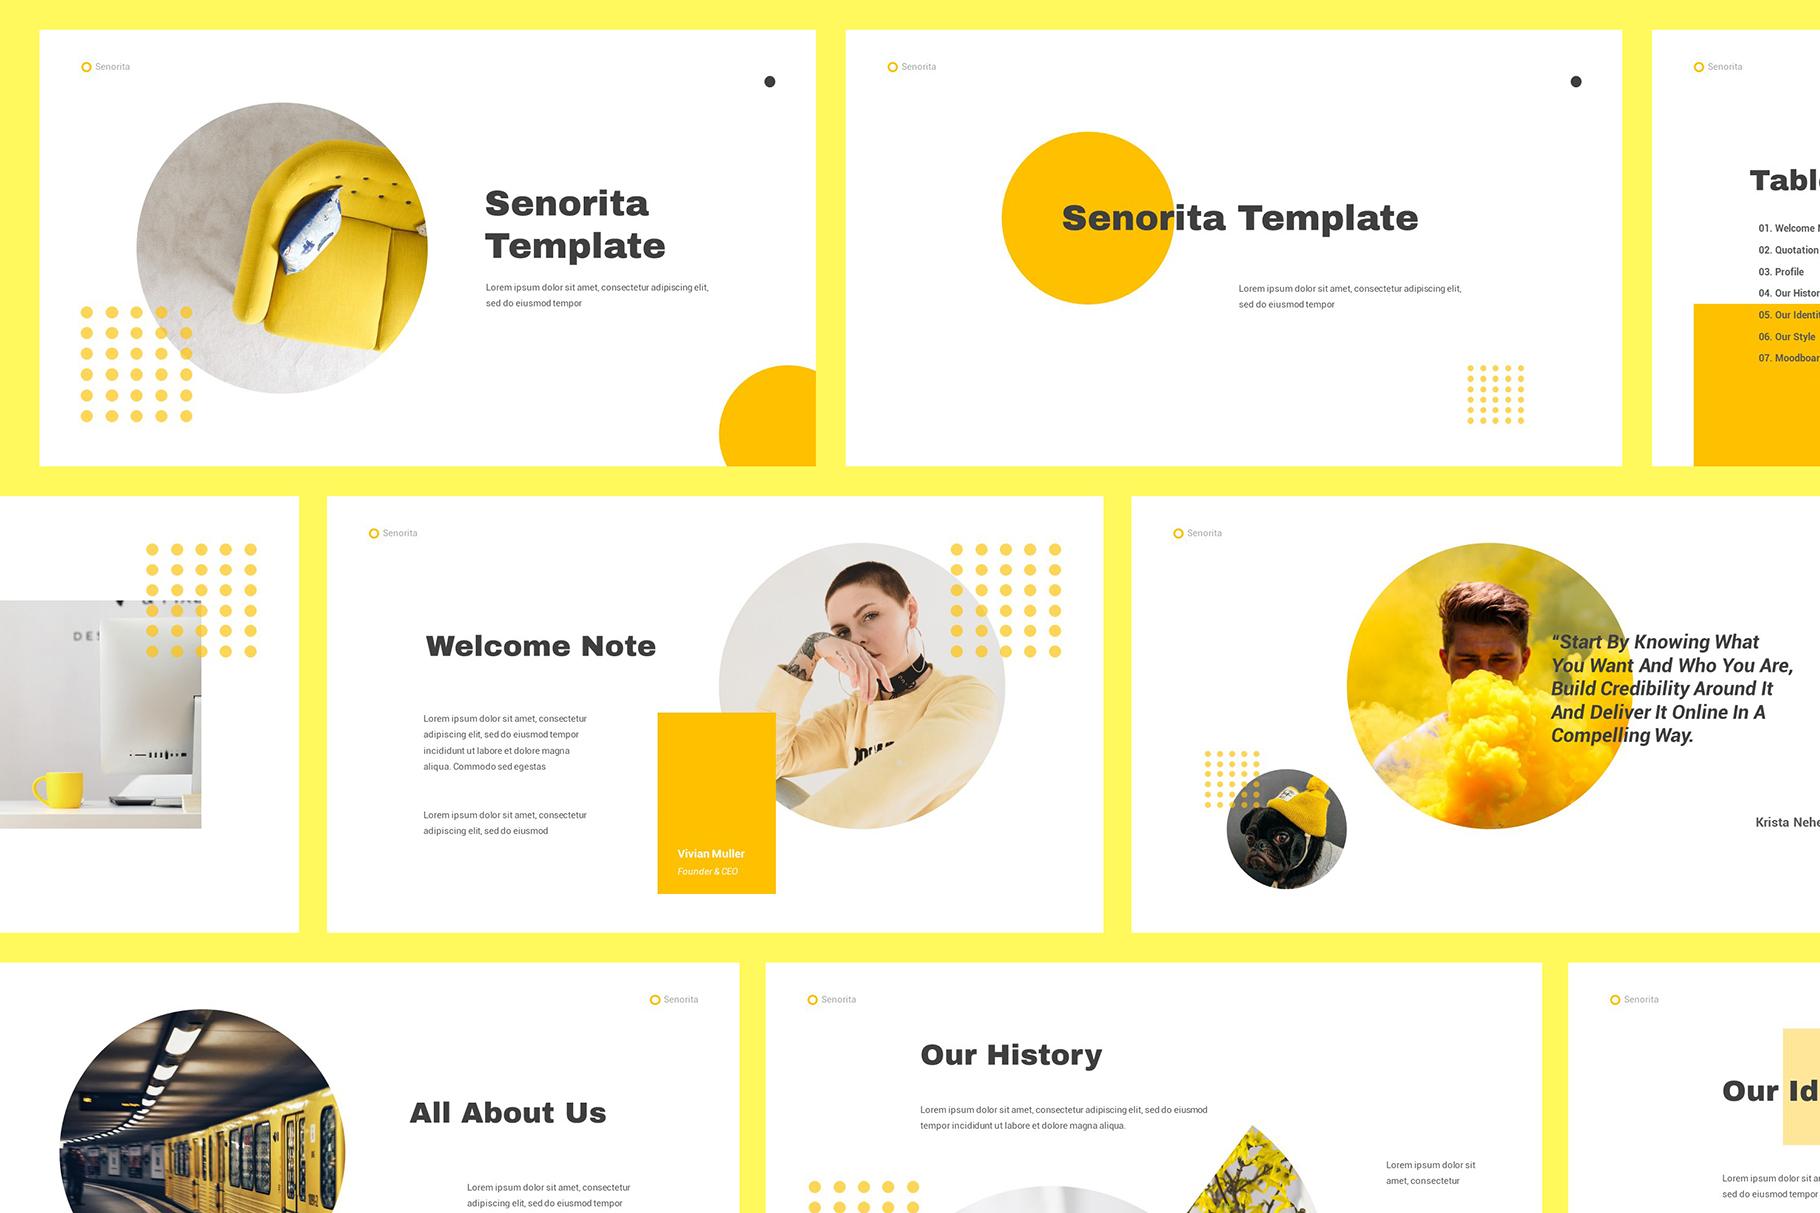 Senorita Brand Guideline Powerpoint example image 1